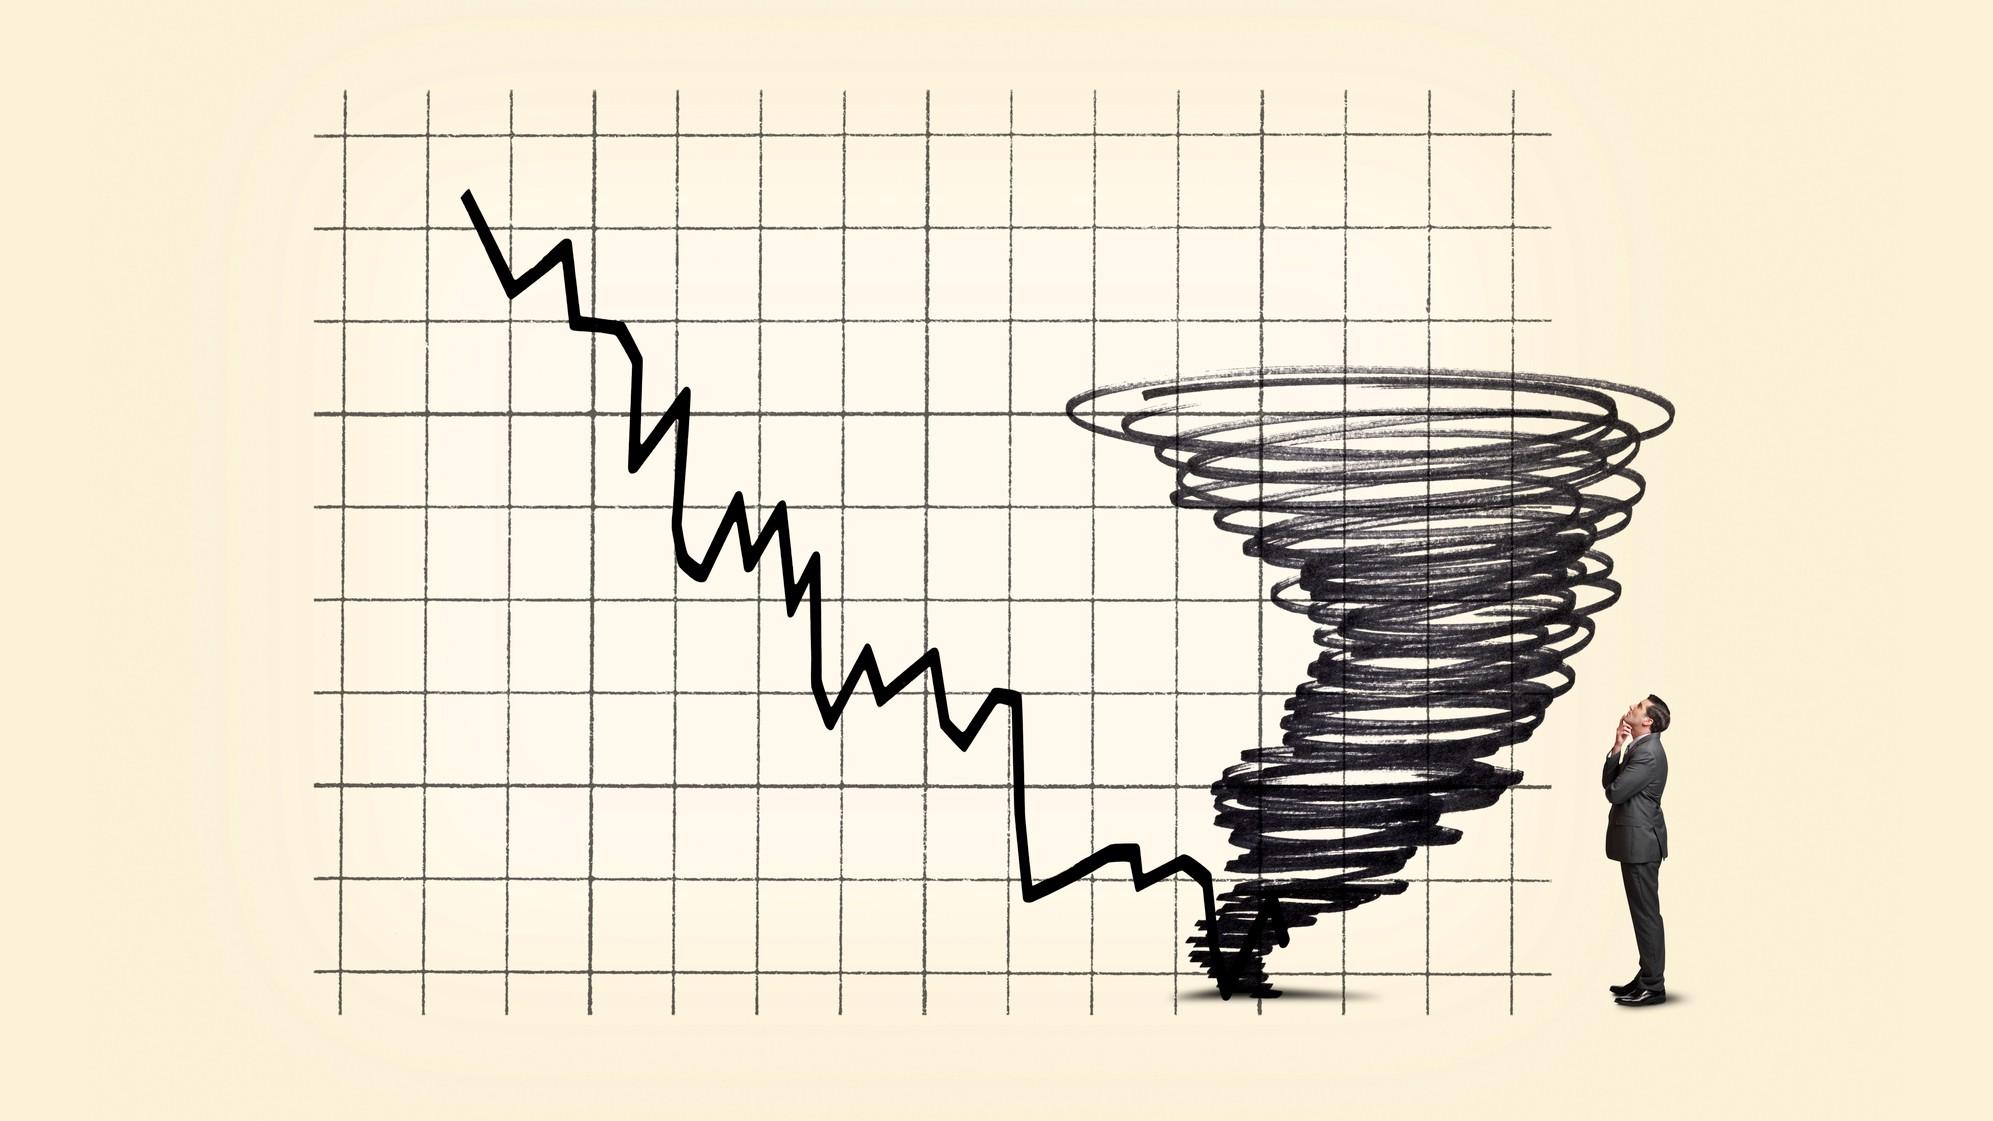 falling graph tornado indicating financial volatility